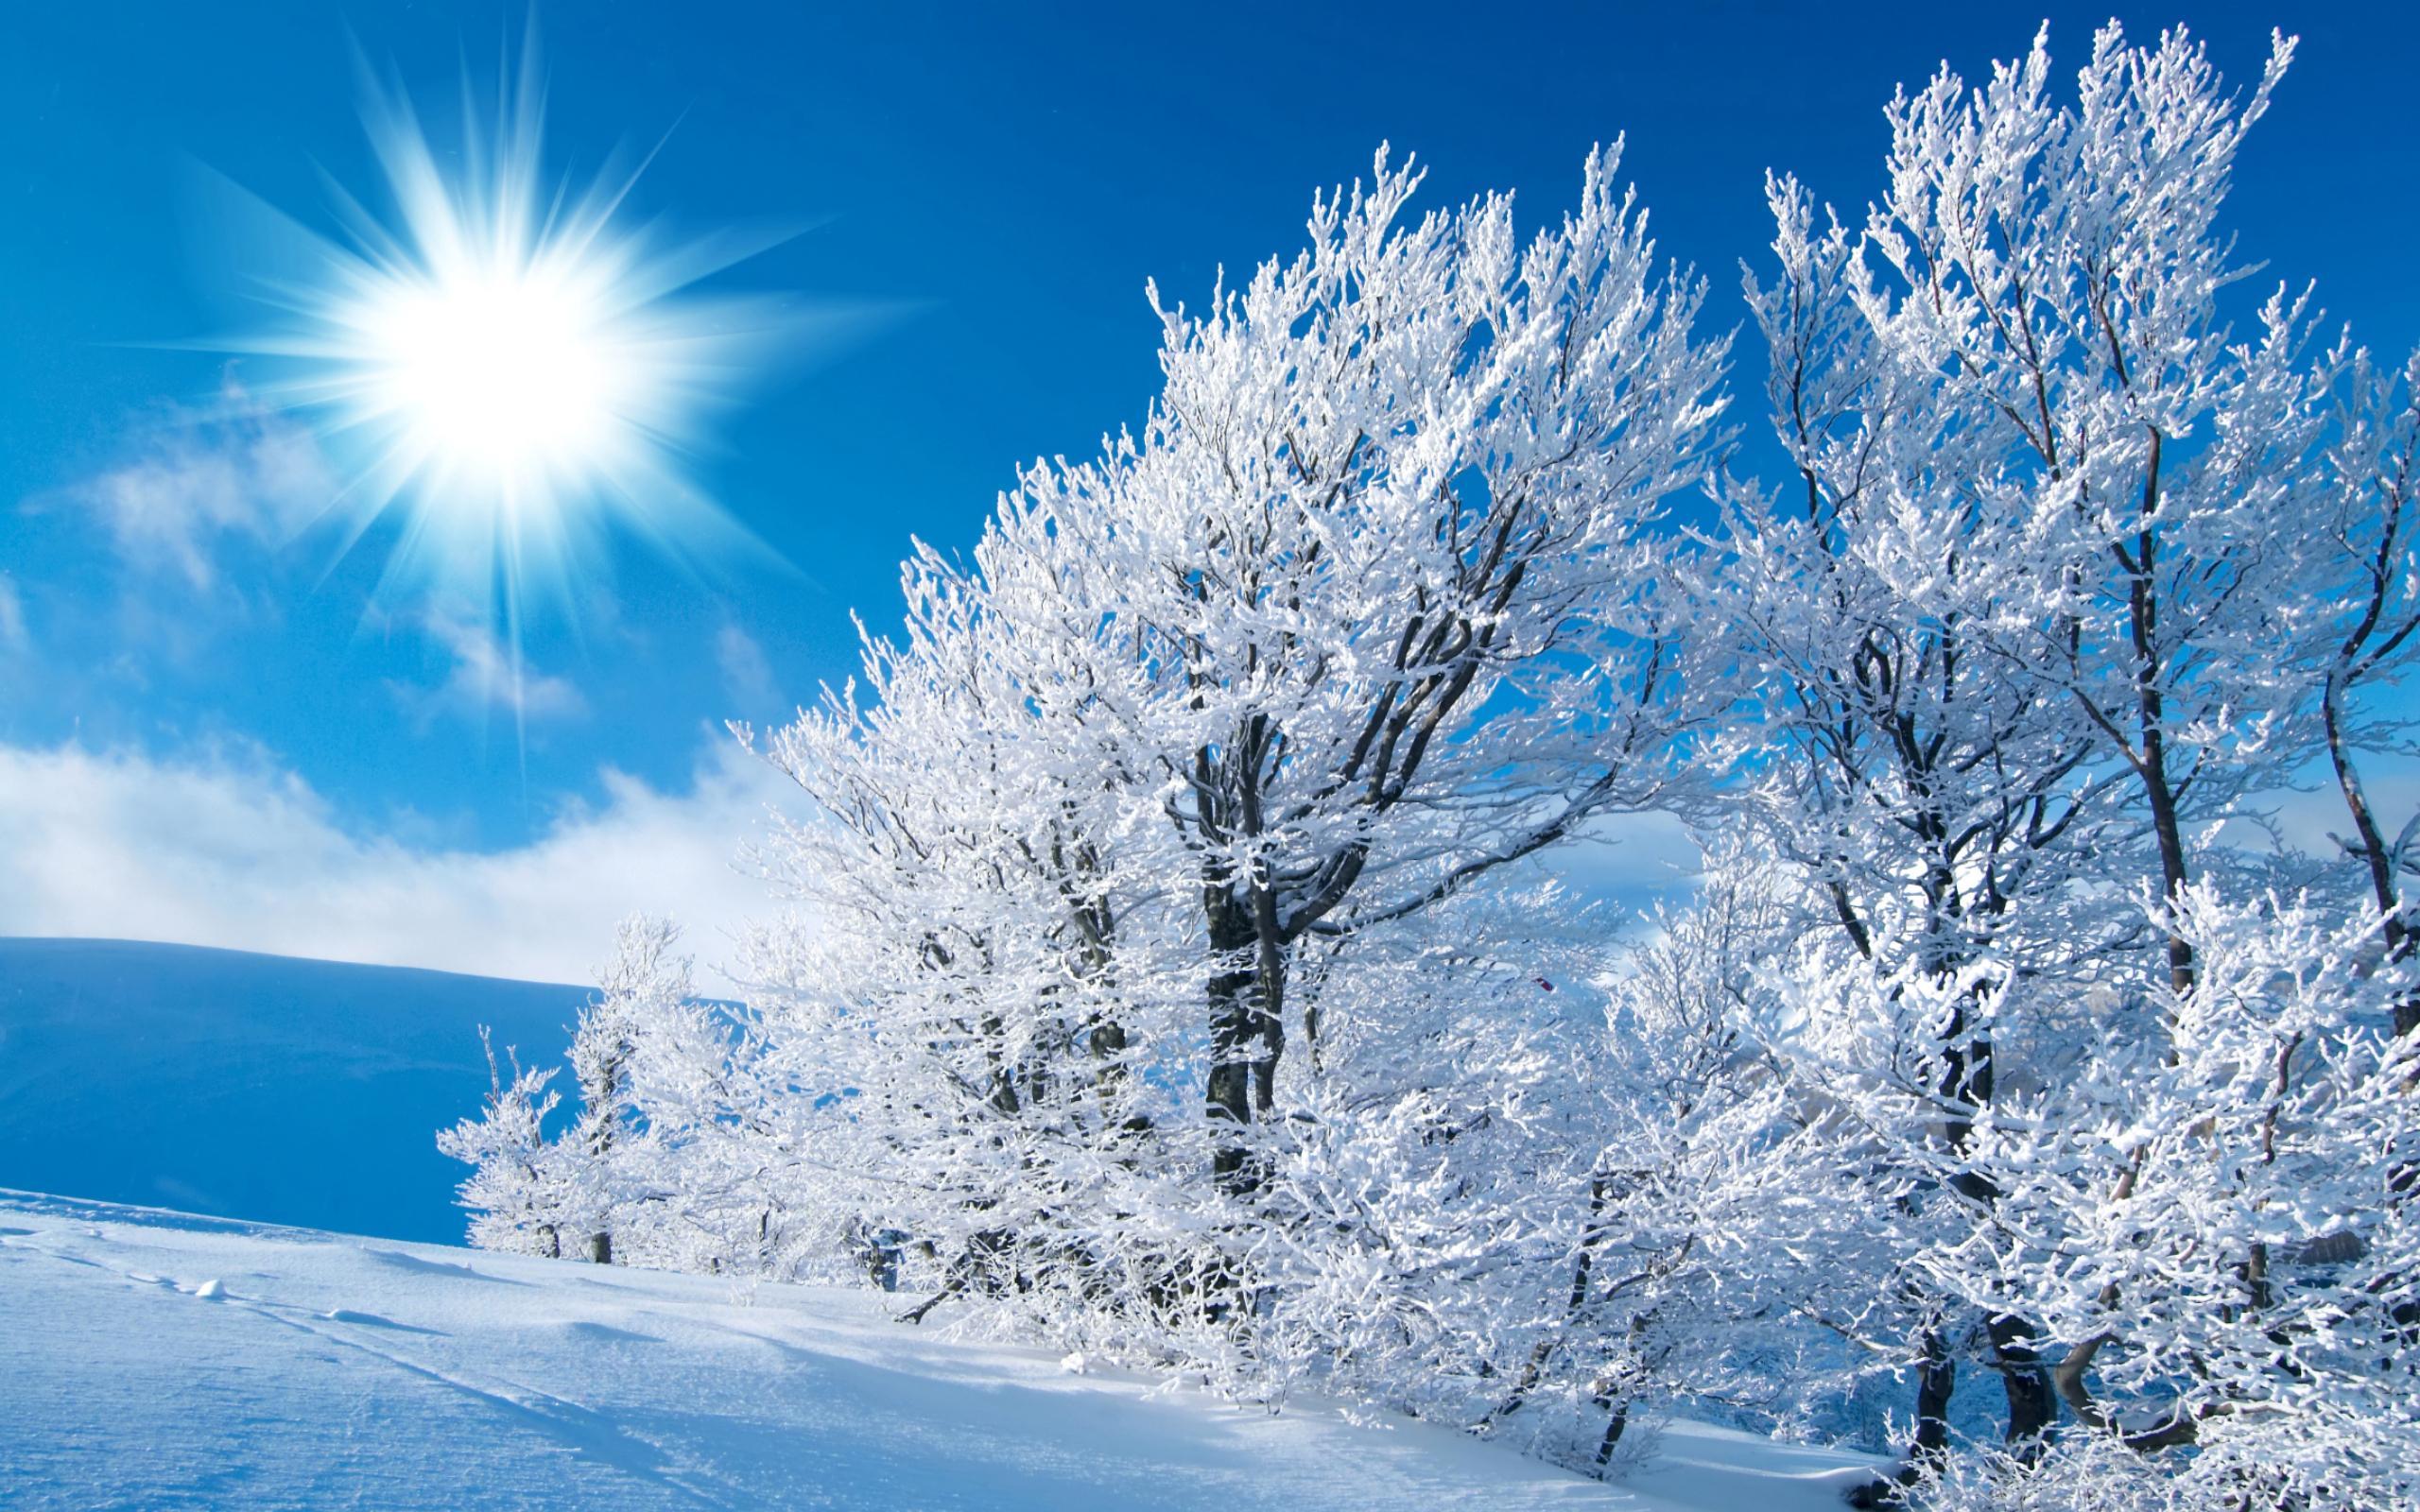 nice best winter wallpapers hd free for desktop 2560x1600